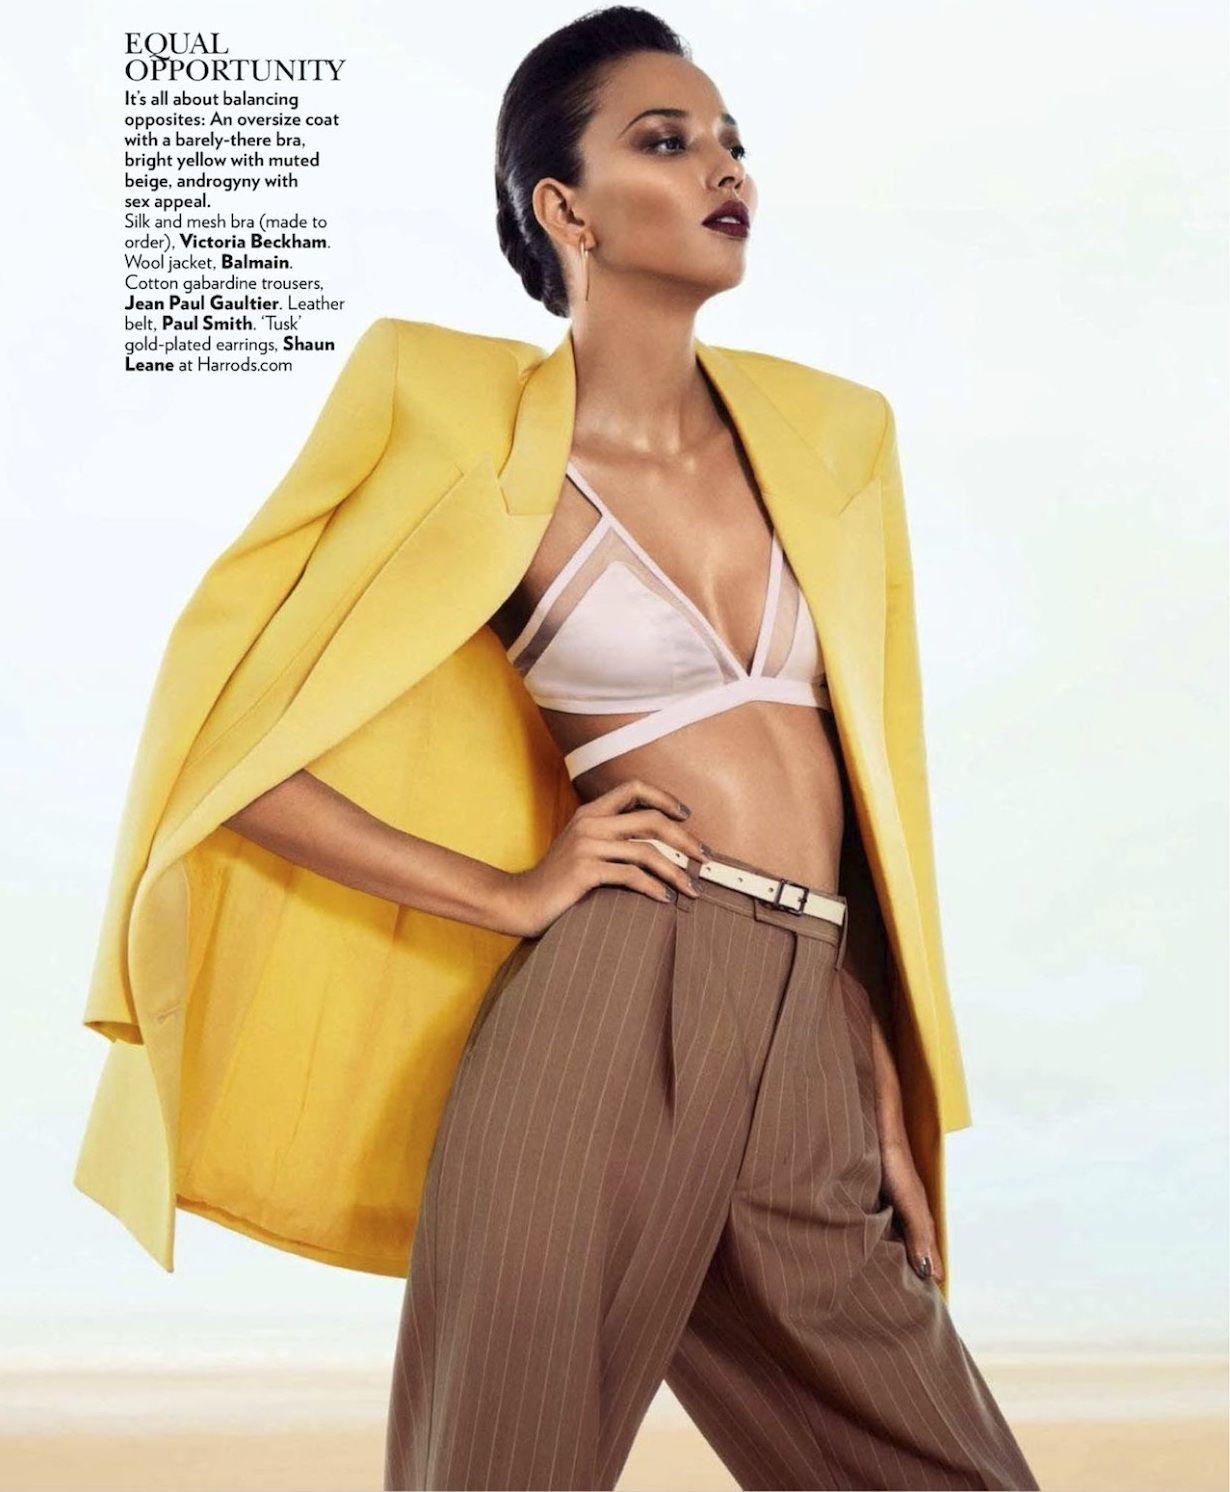 Daniela Alves Rezende photographed by Grant Thomas for Vogue India July 2013.